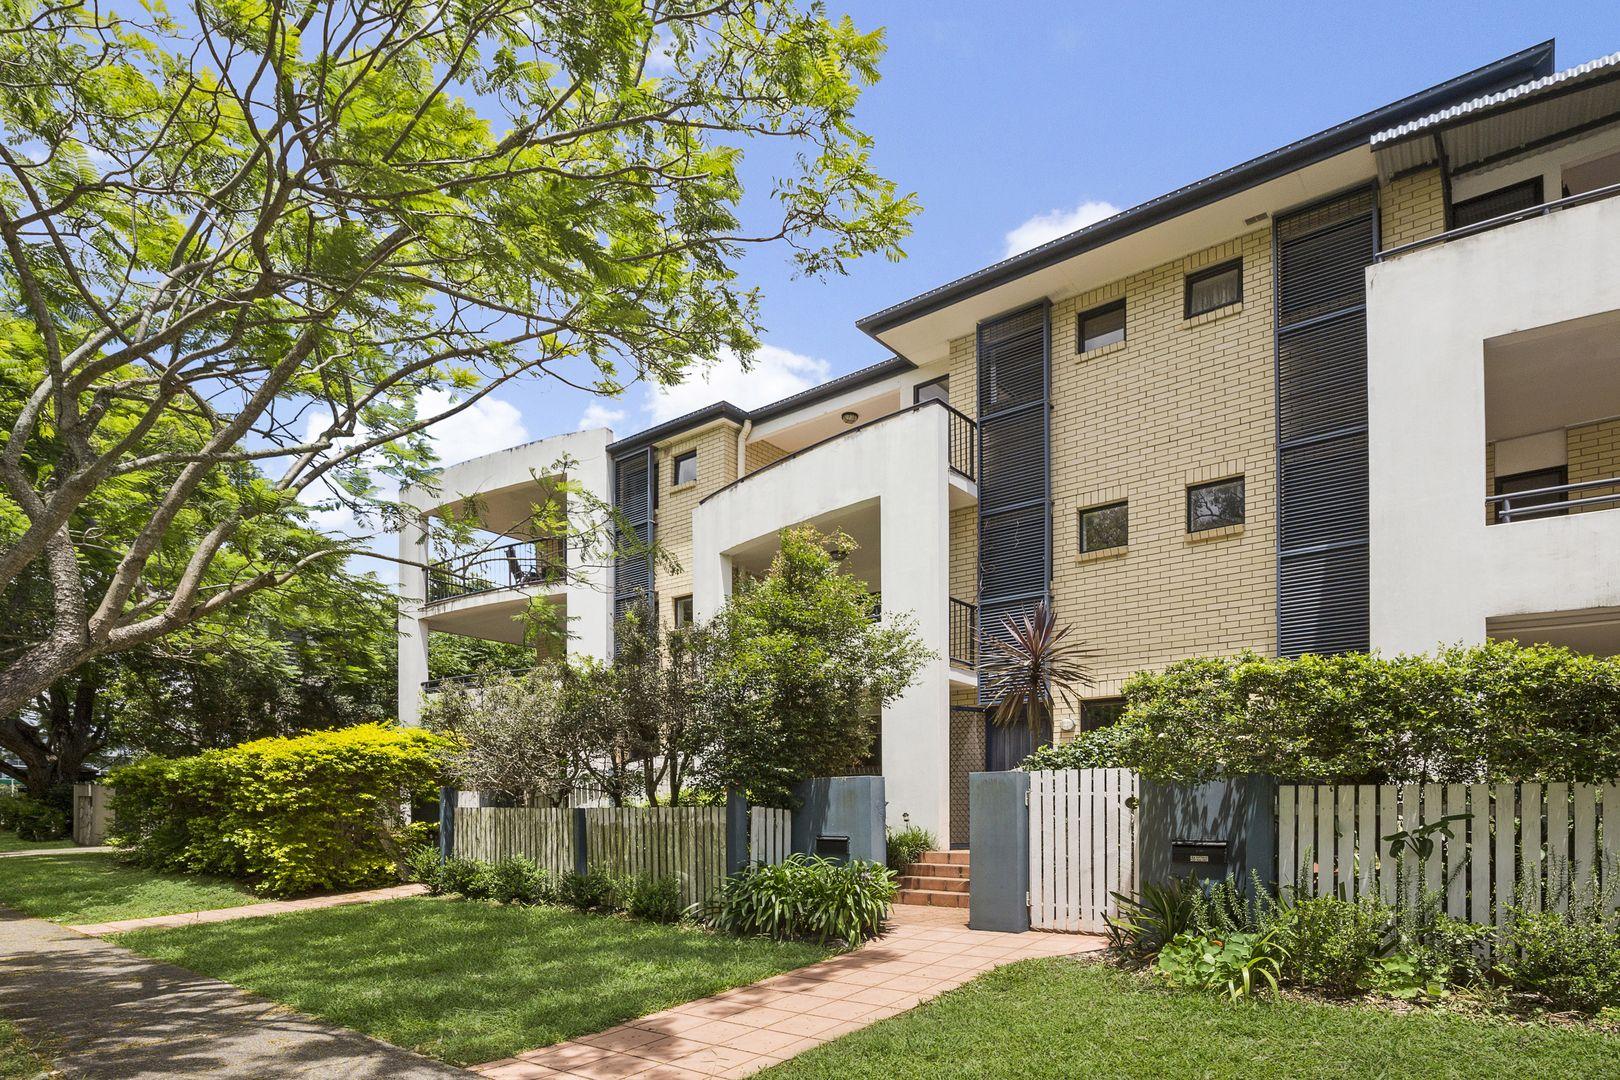 3/177 Macquarie Street, St Lucia QLD 4067, Image 0